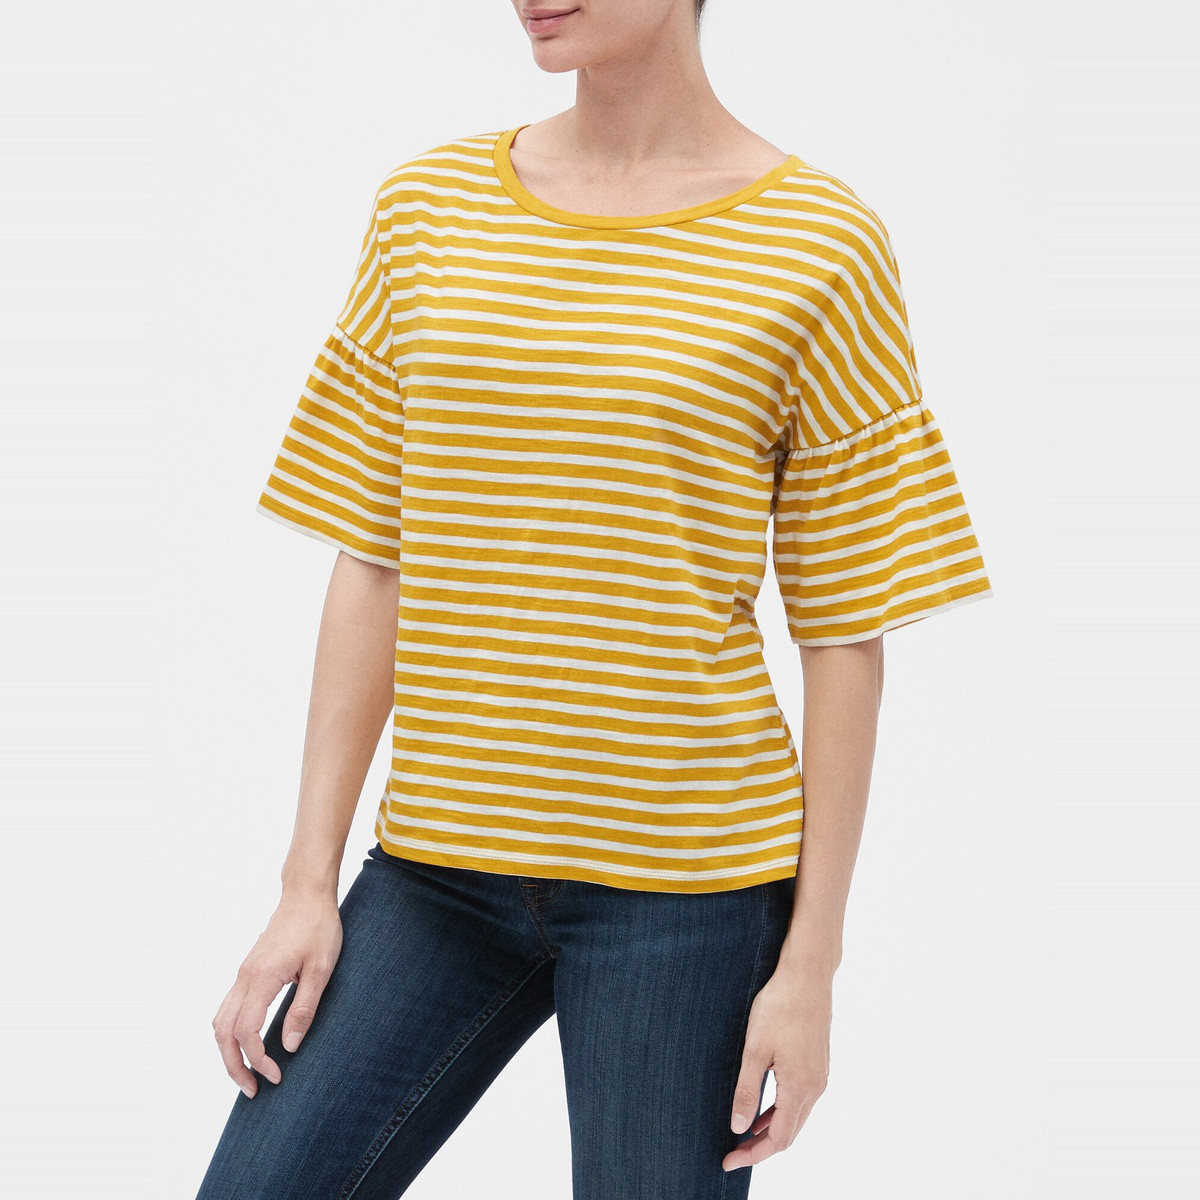 Gap 盖璞 495586 女士喇叭袖T恤